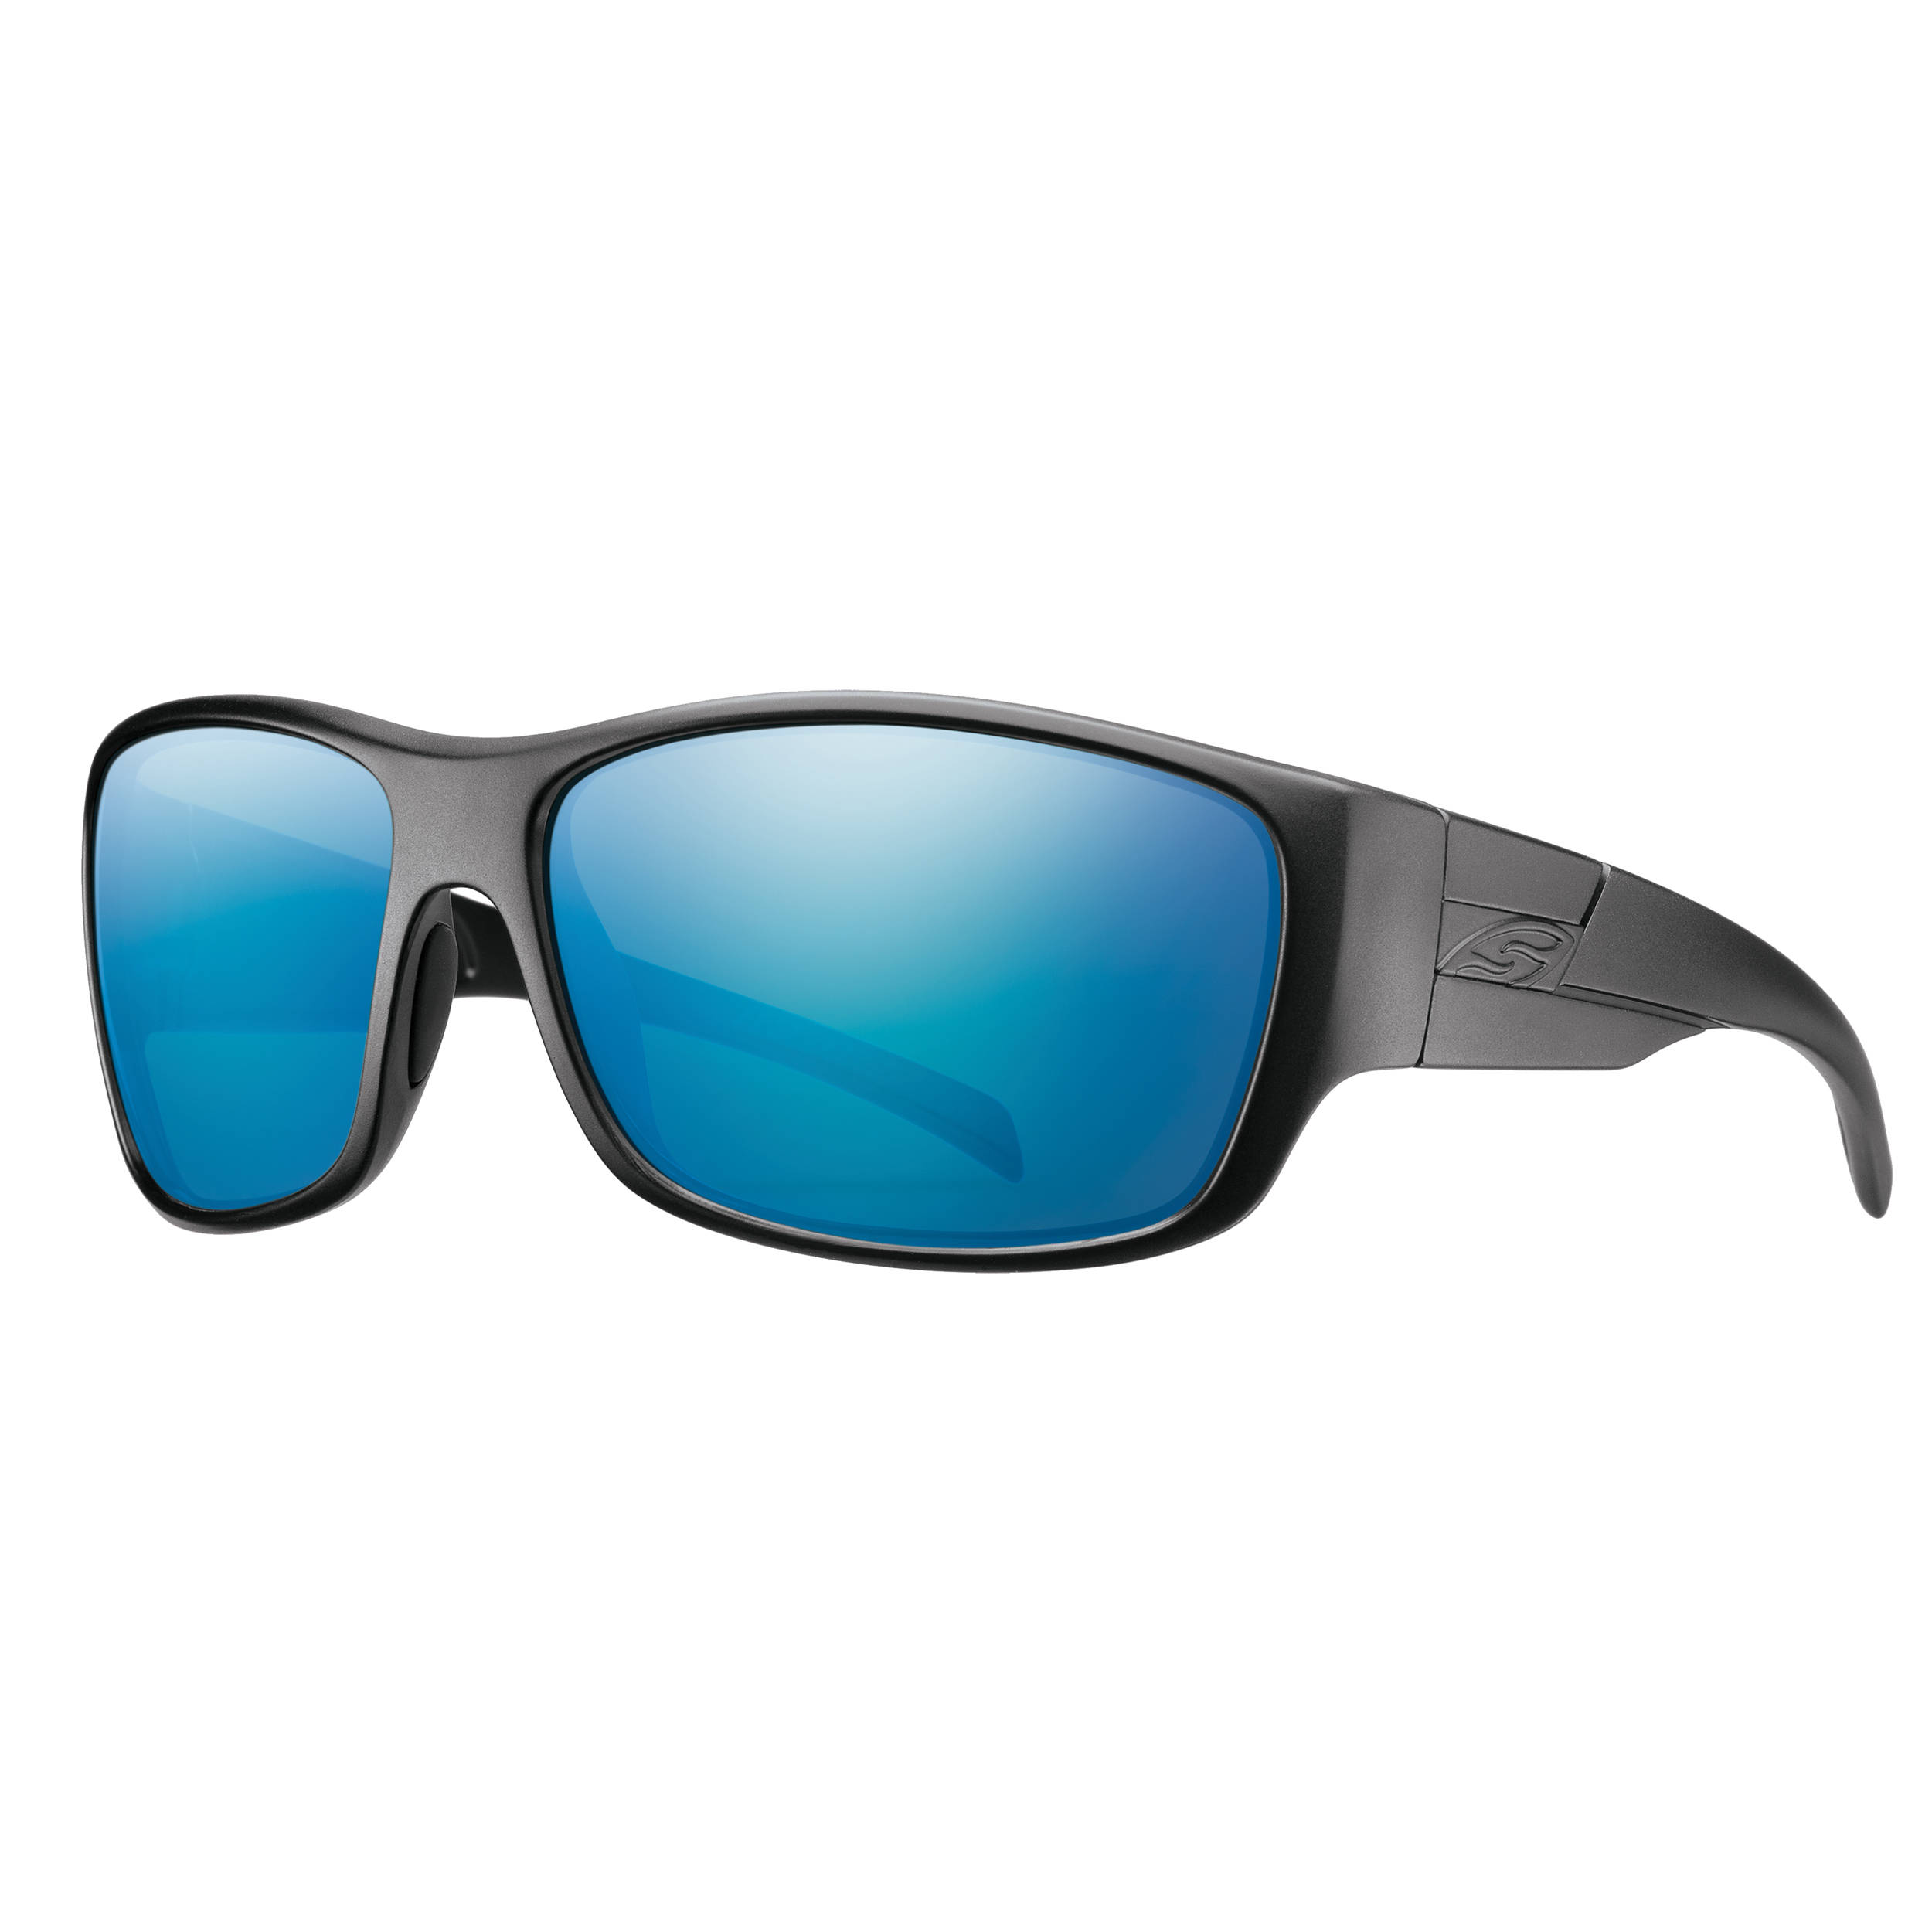 da53c44a9f Smith Optics Frontman Elite Ballistic Sunglasses (Black   ChromaPop Polar  Blue Mirror)